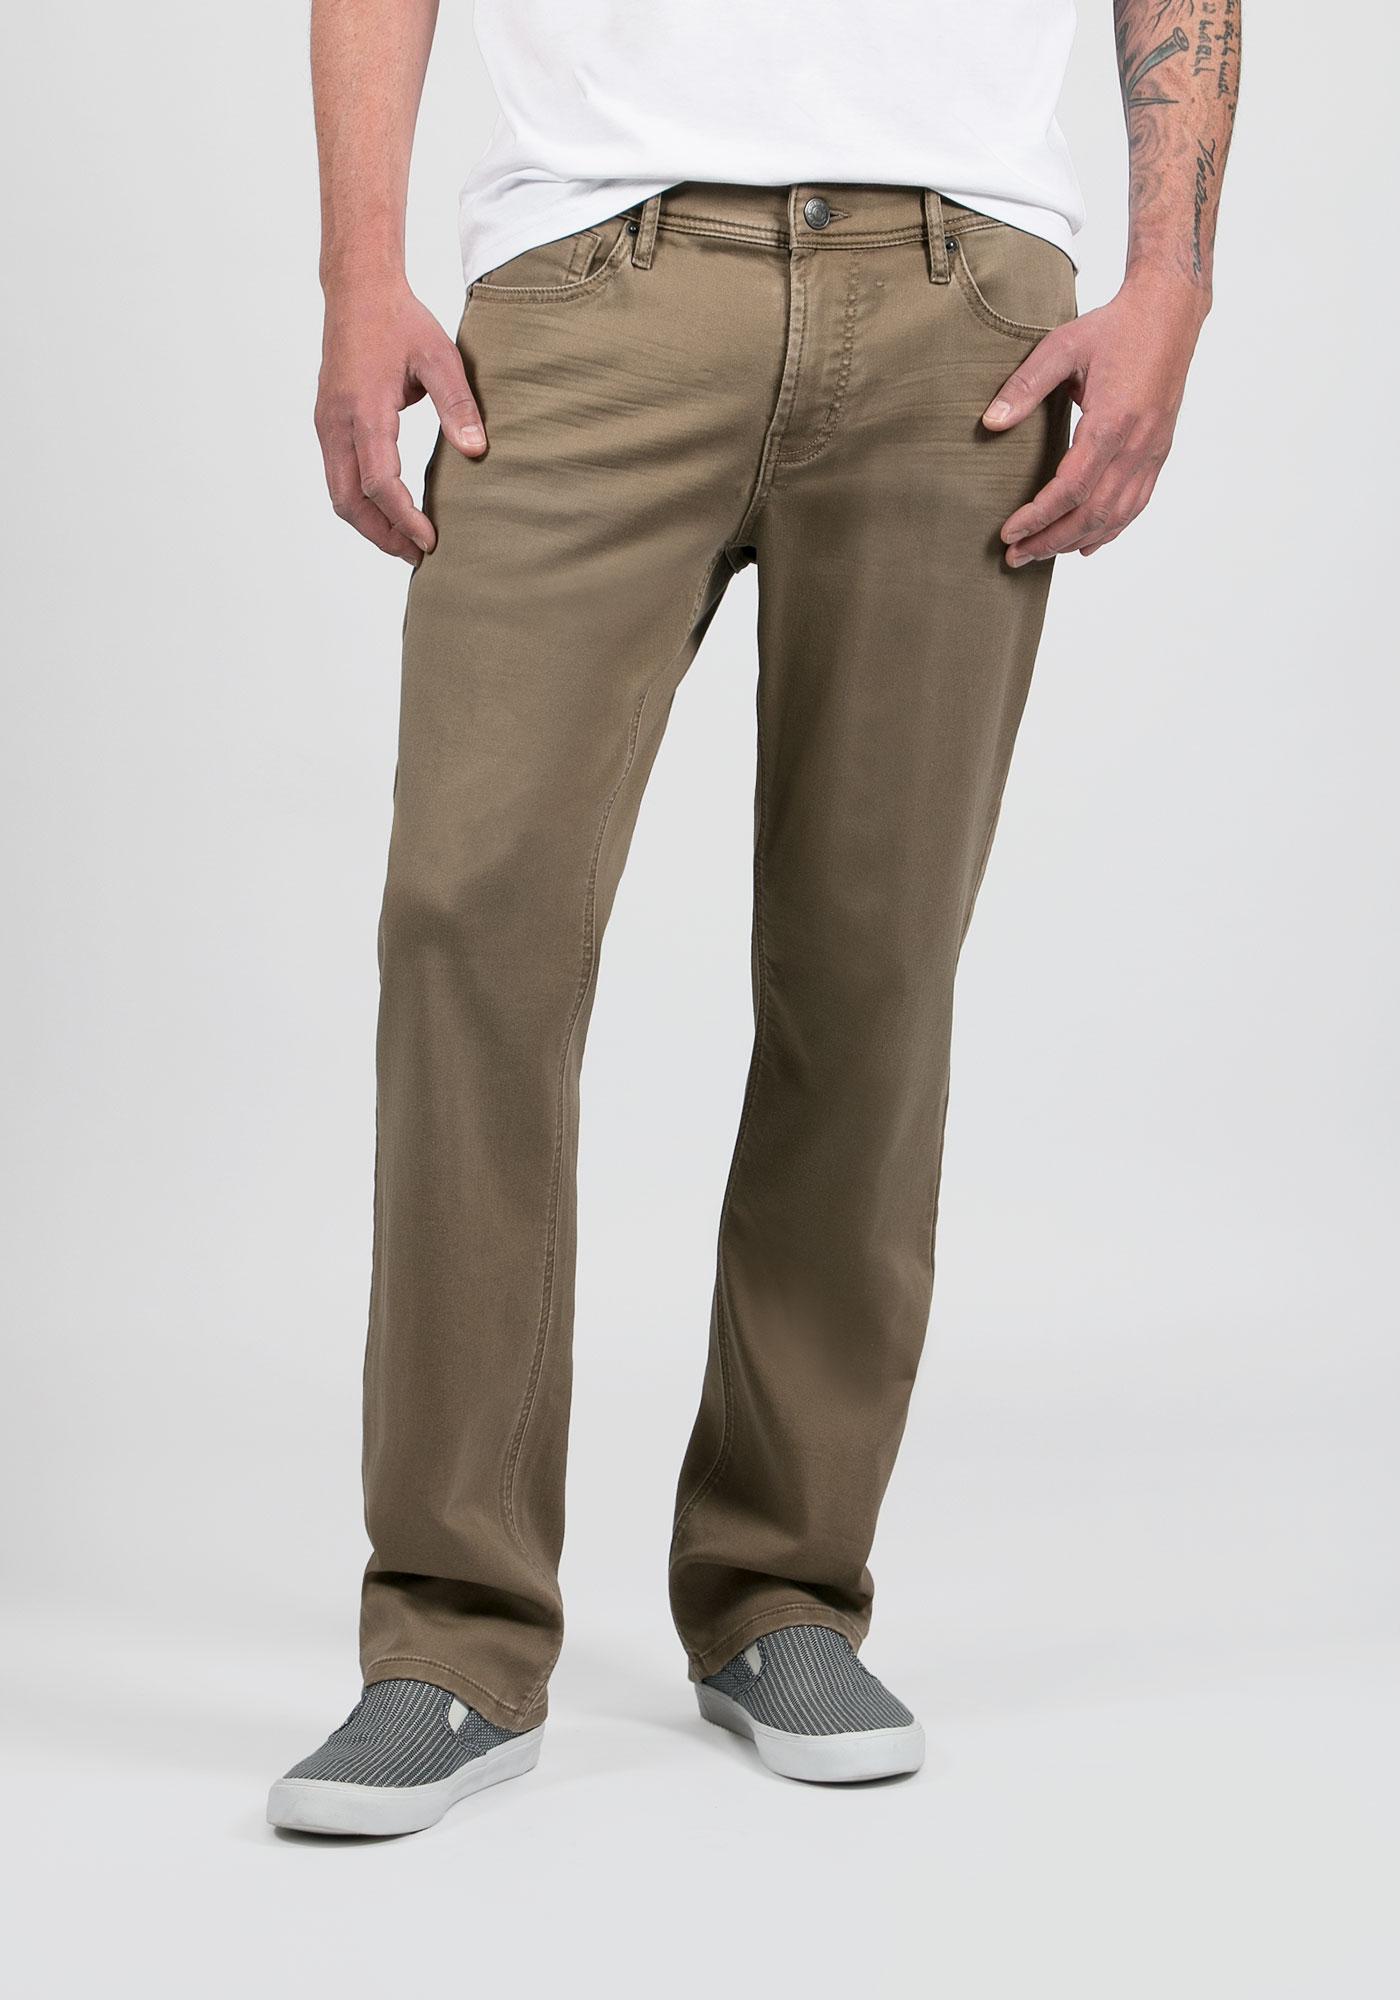 Size 28 Mens Jeans